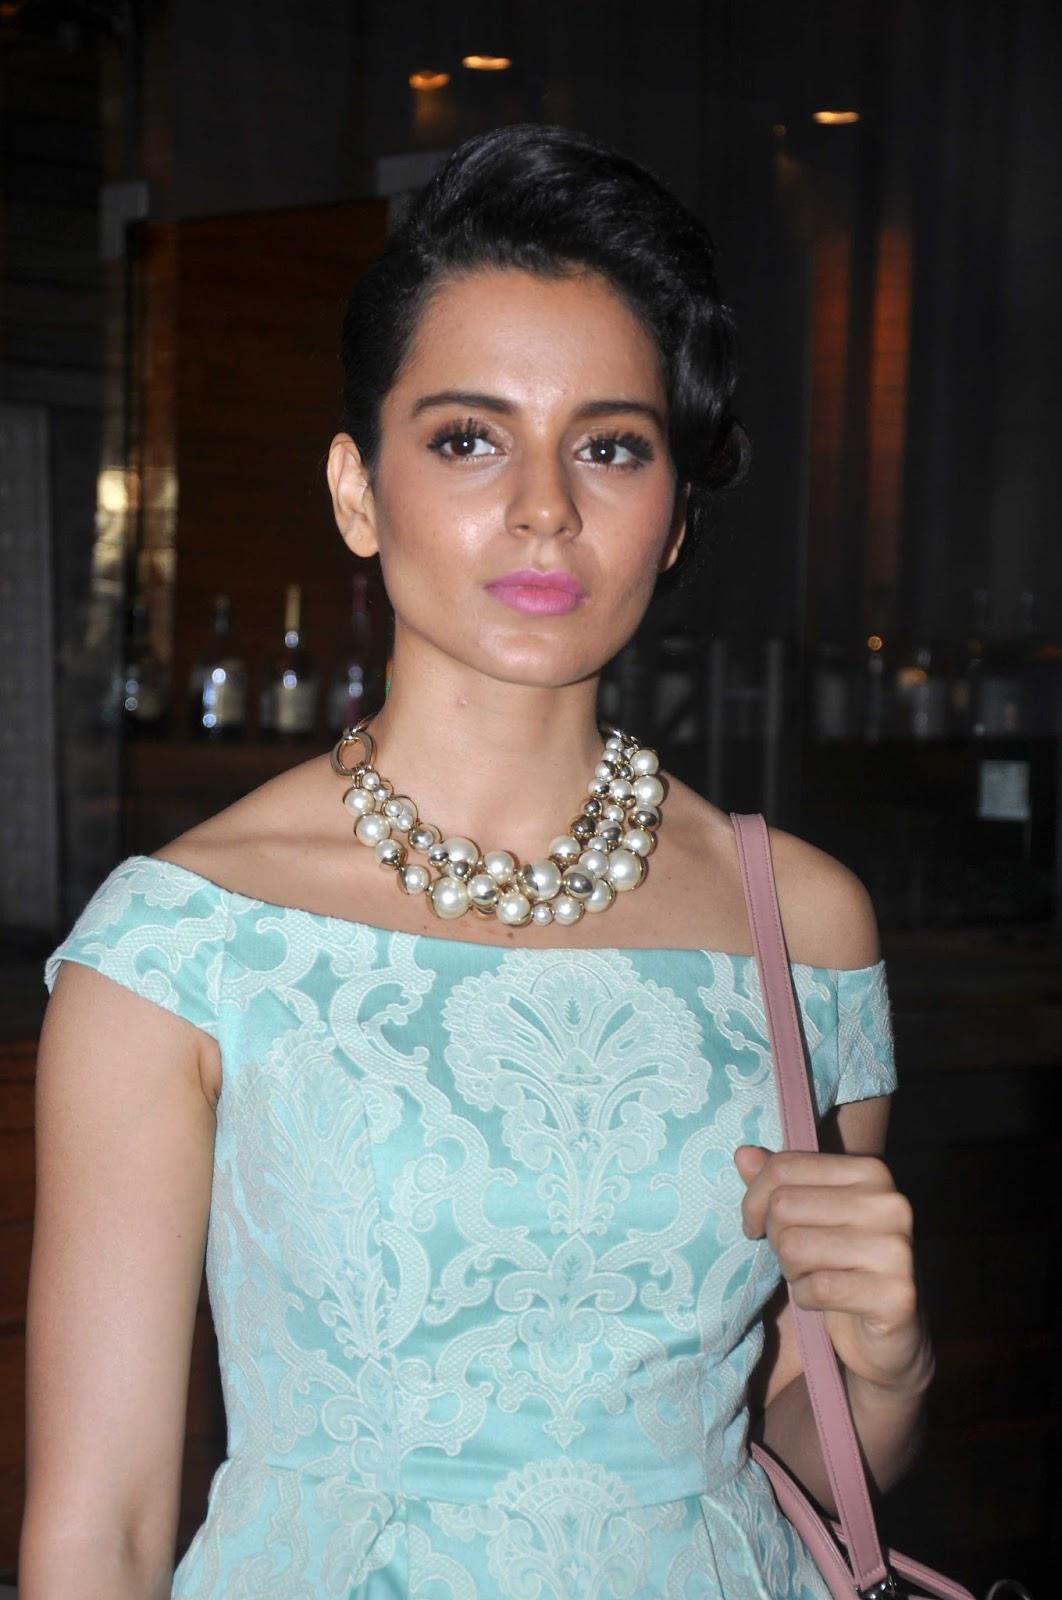 Bollywood Film Celebrity Kangana Ranaut Spicy HQ Images - mass420 - 21